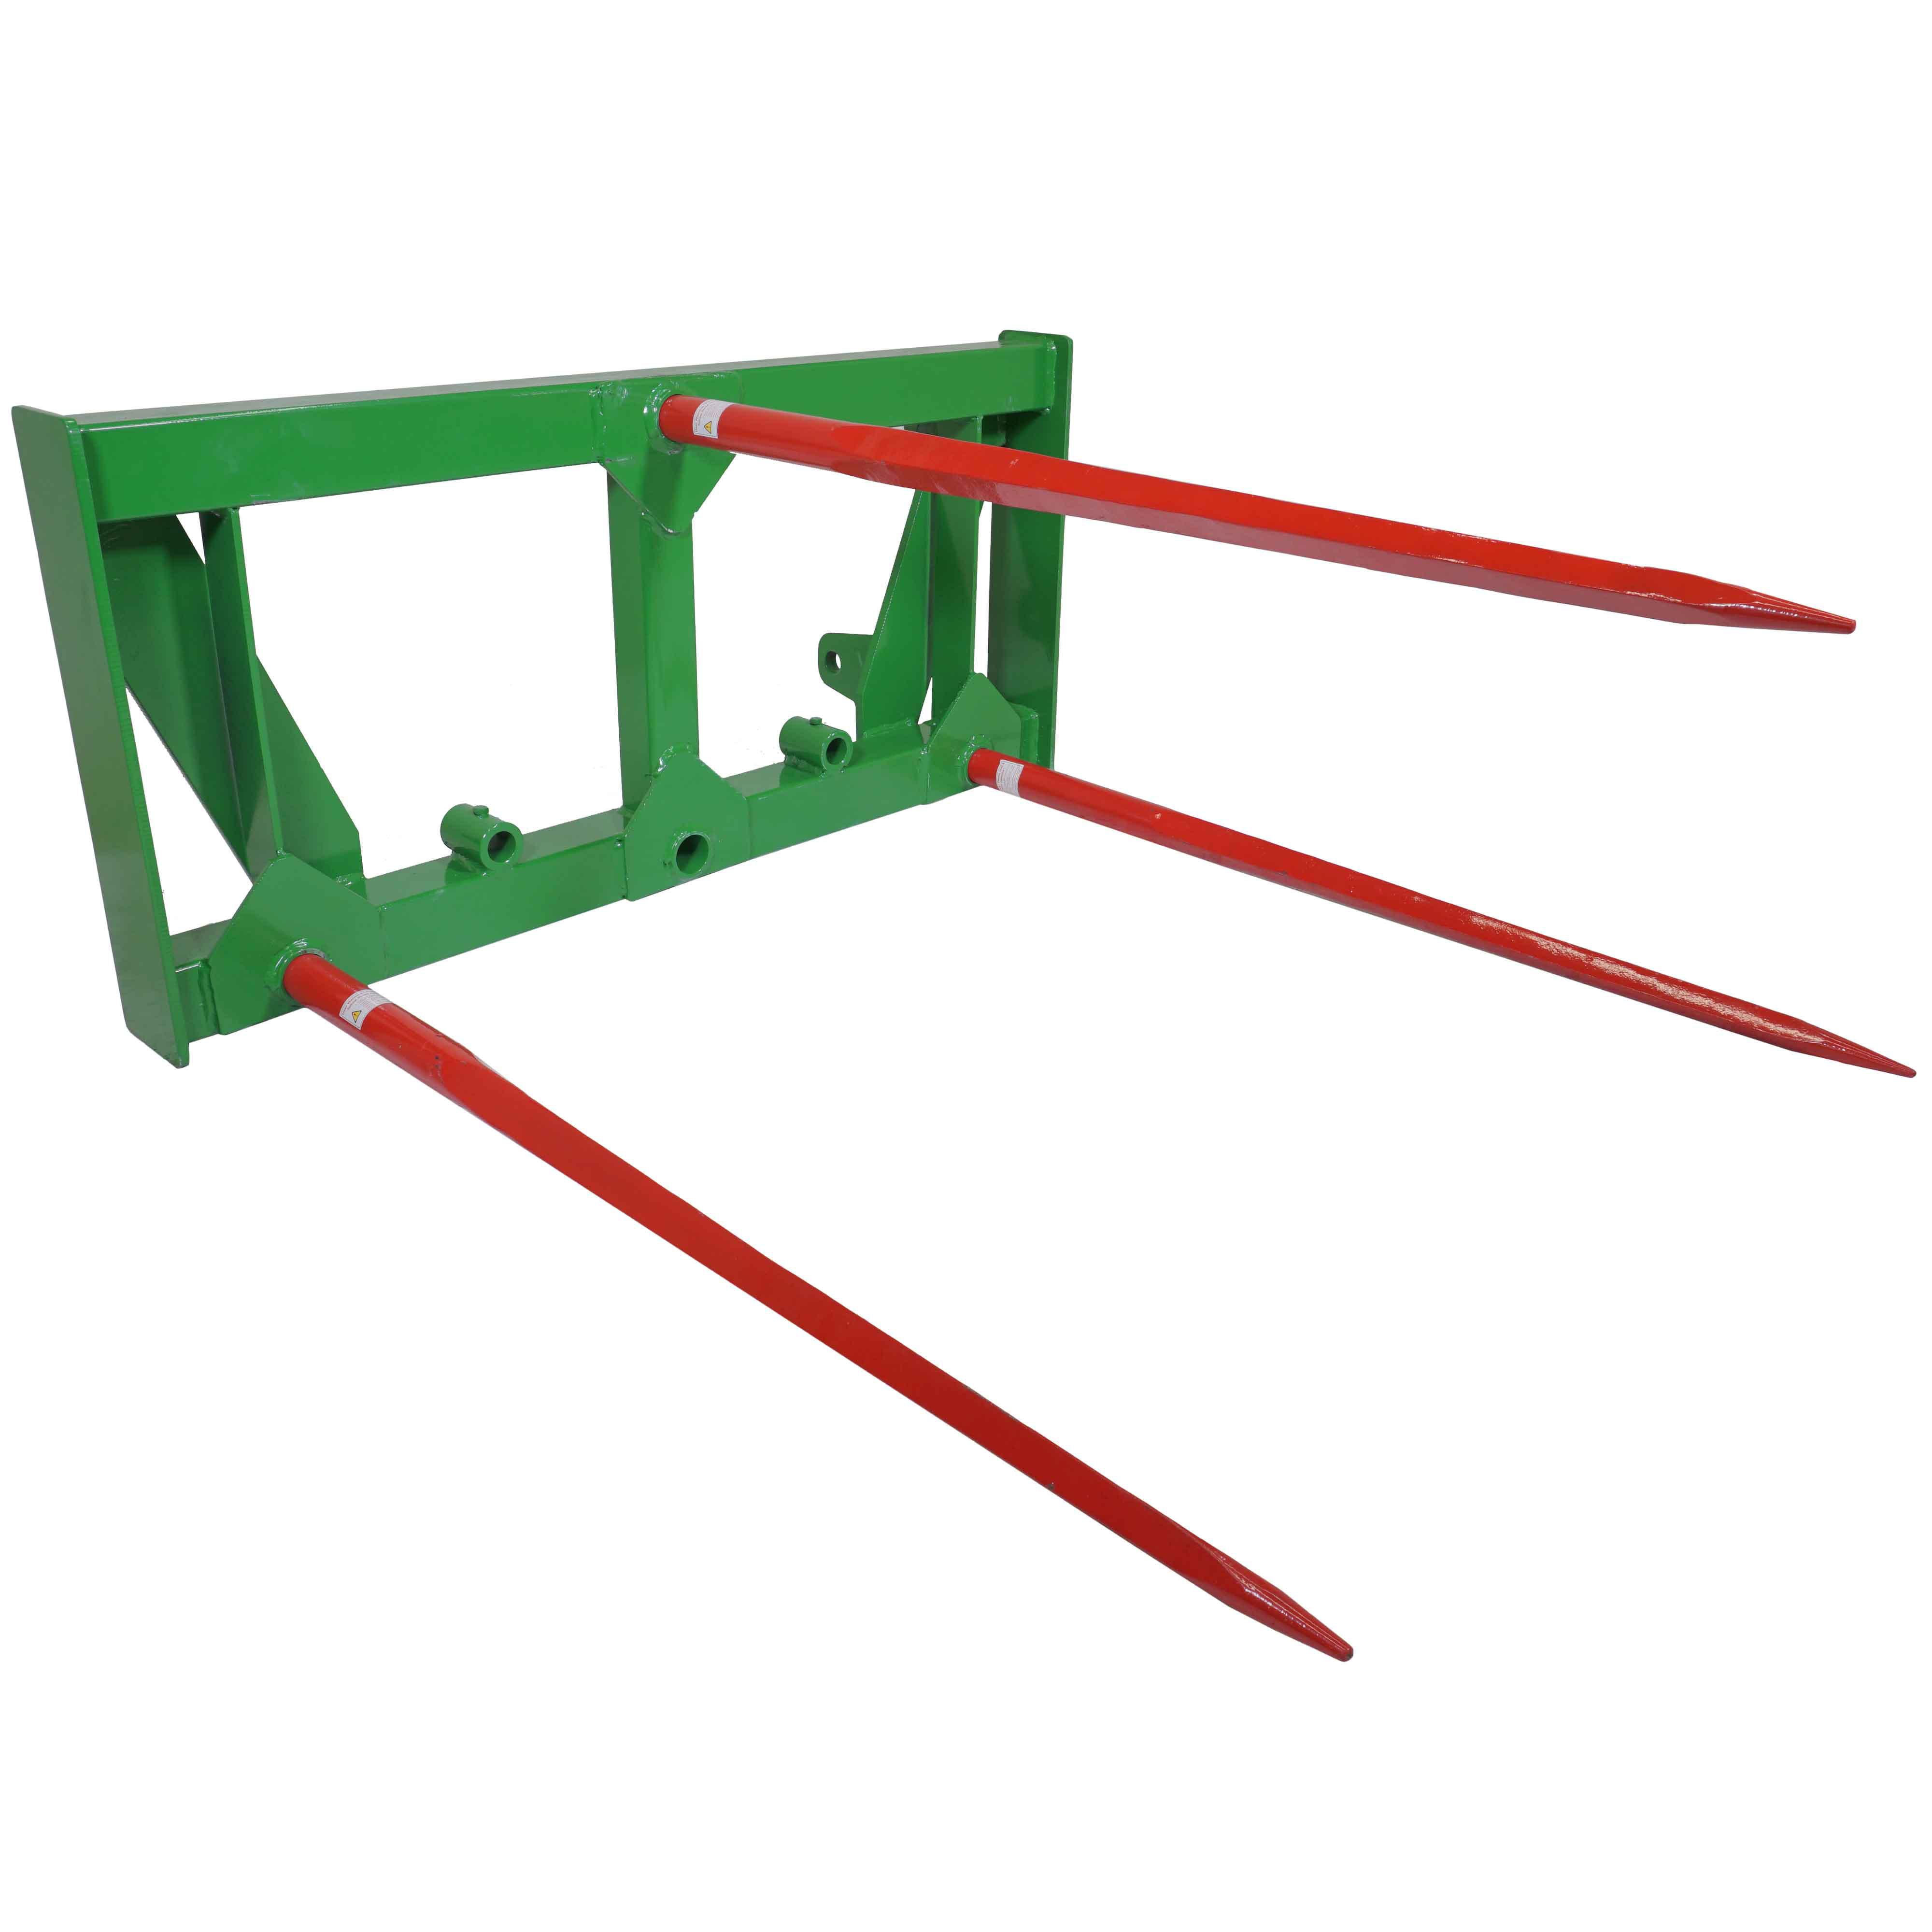 Titan John Deere Global Euro HD Frame Attachment 3 Hay Spears Loader Tractor